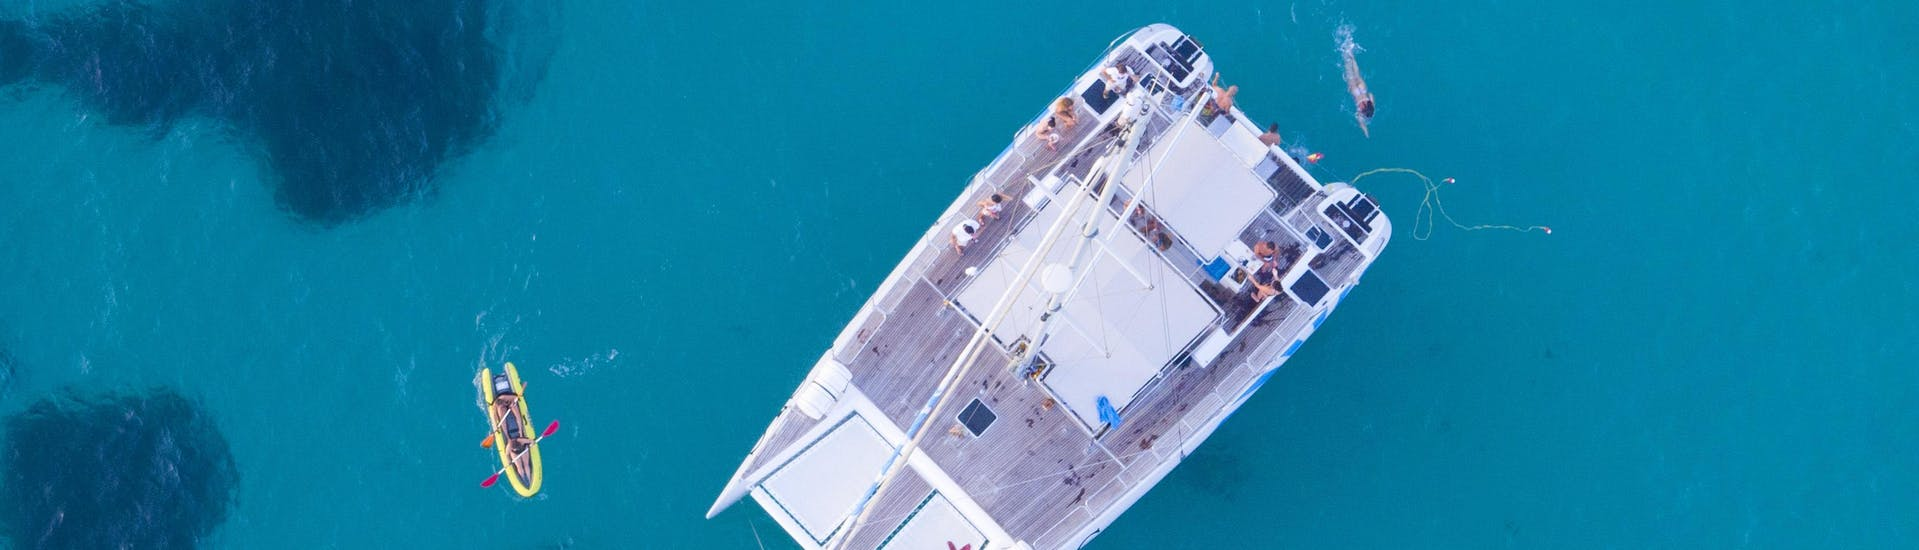 Sailing Catamaran Cruise in the Bay of Palma with Snorkeling